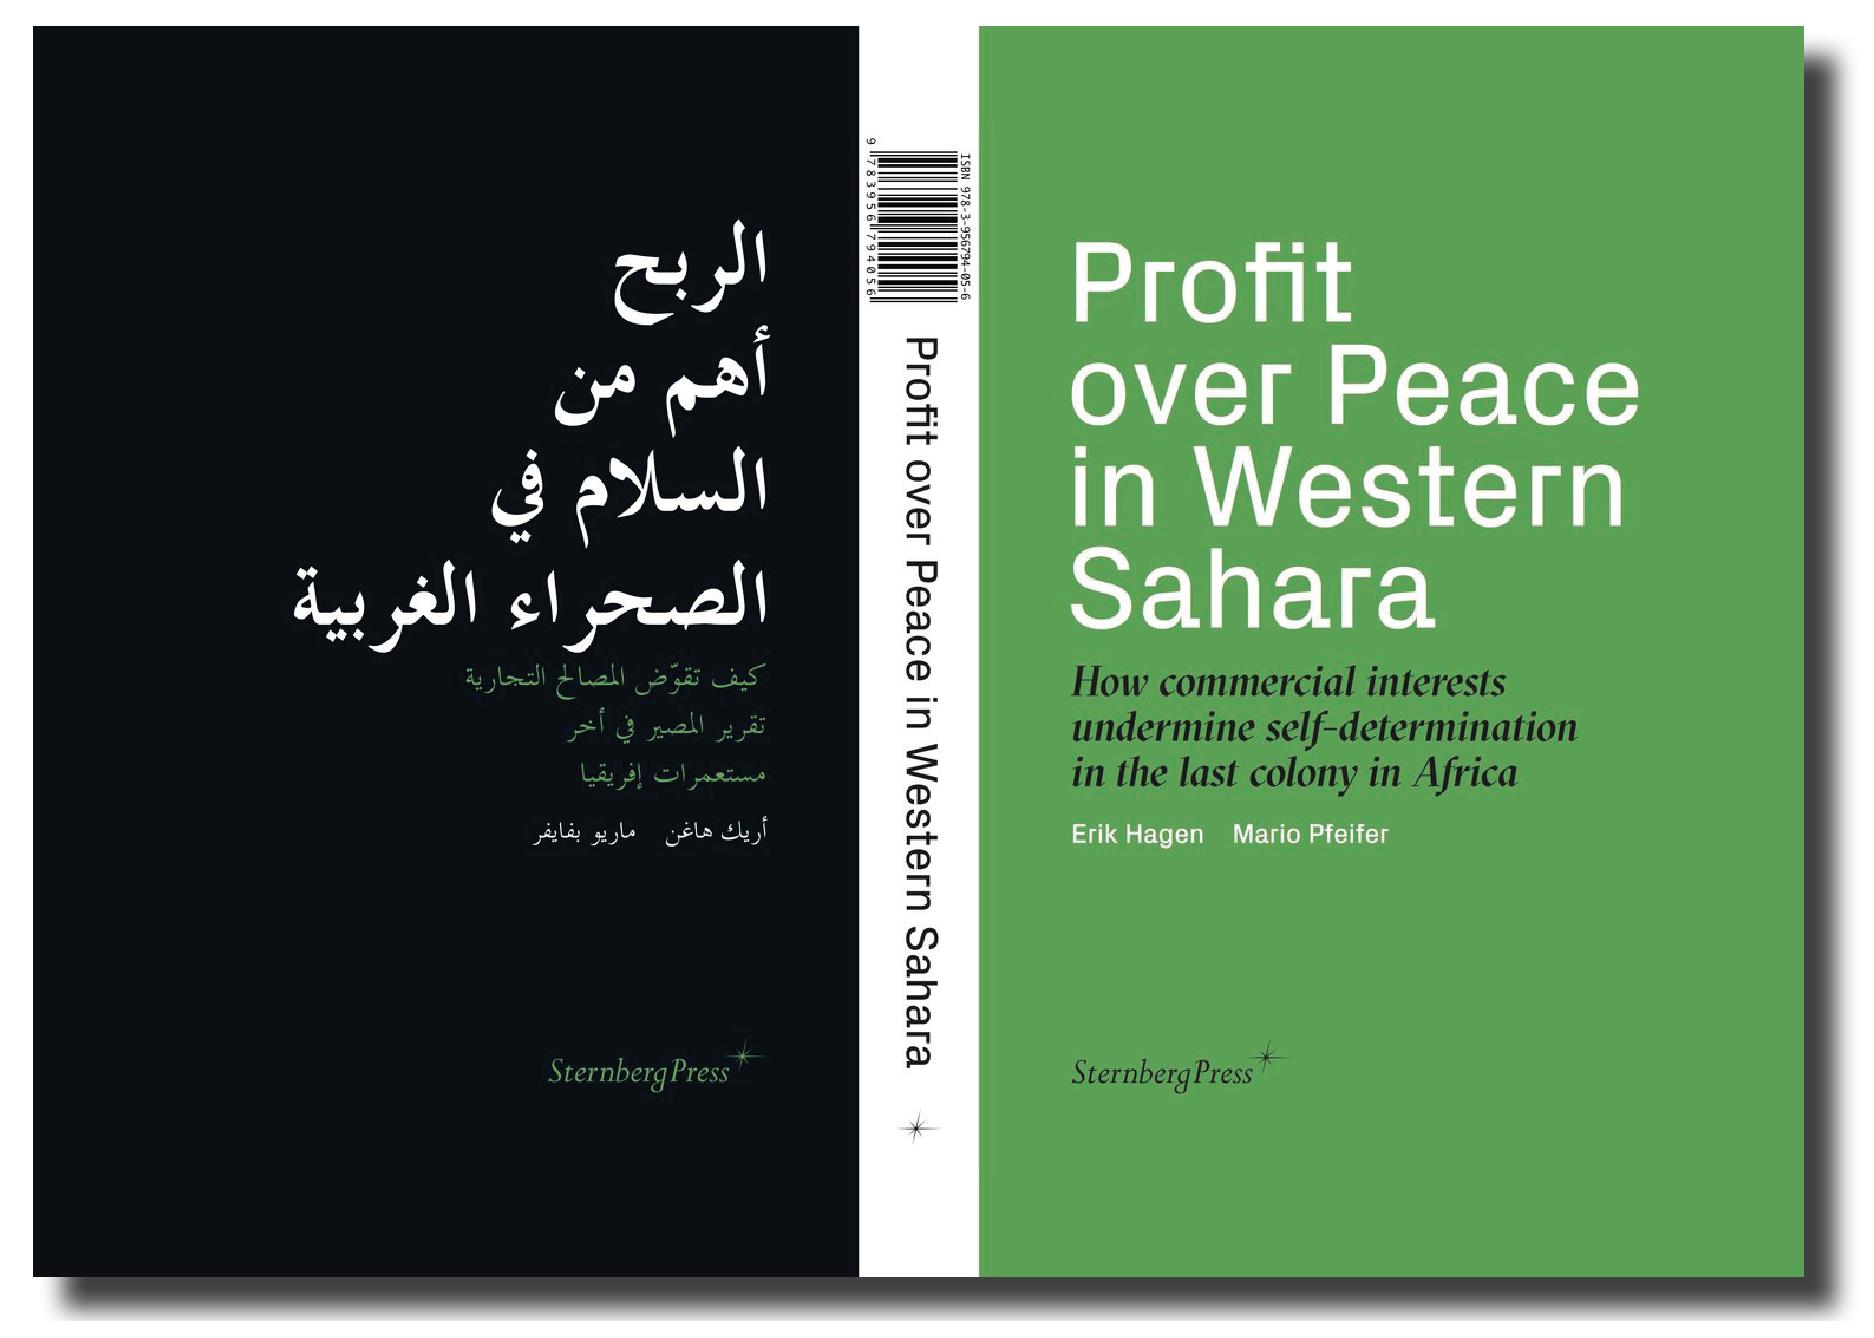 Profit_over_Peace_MarioPfeifer_Sternberg-Press.png